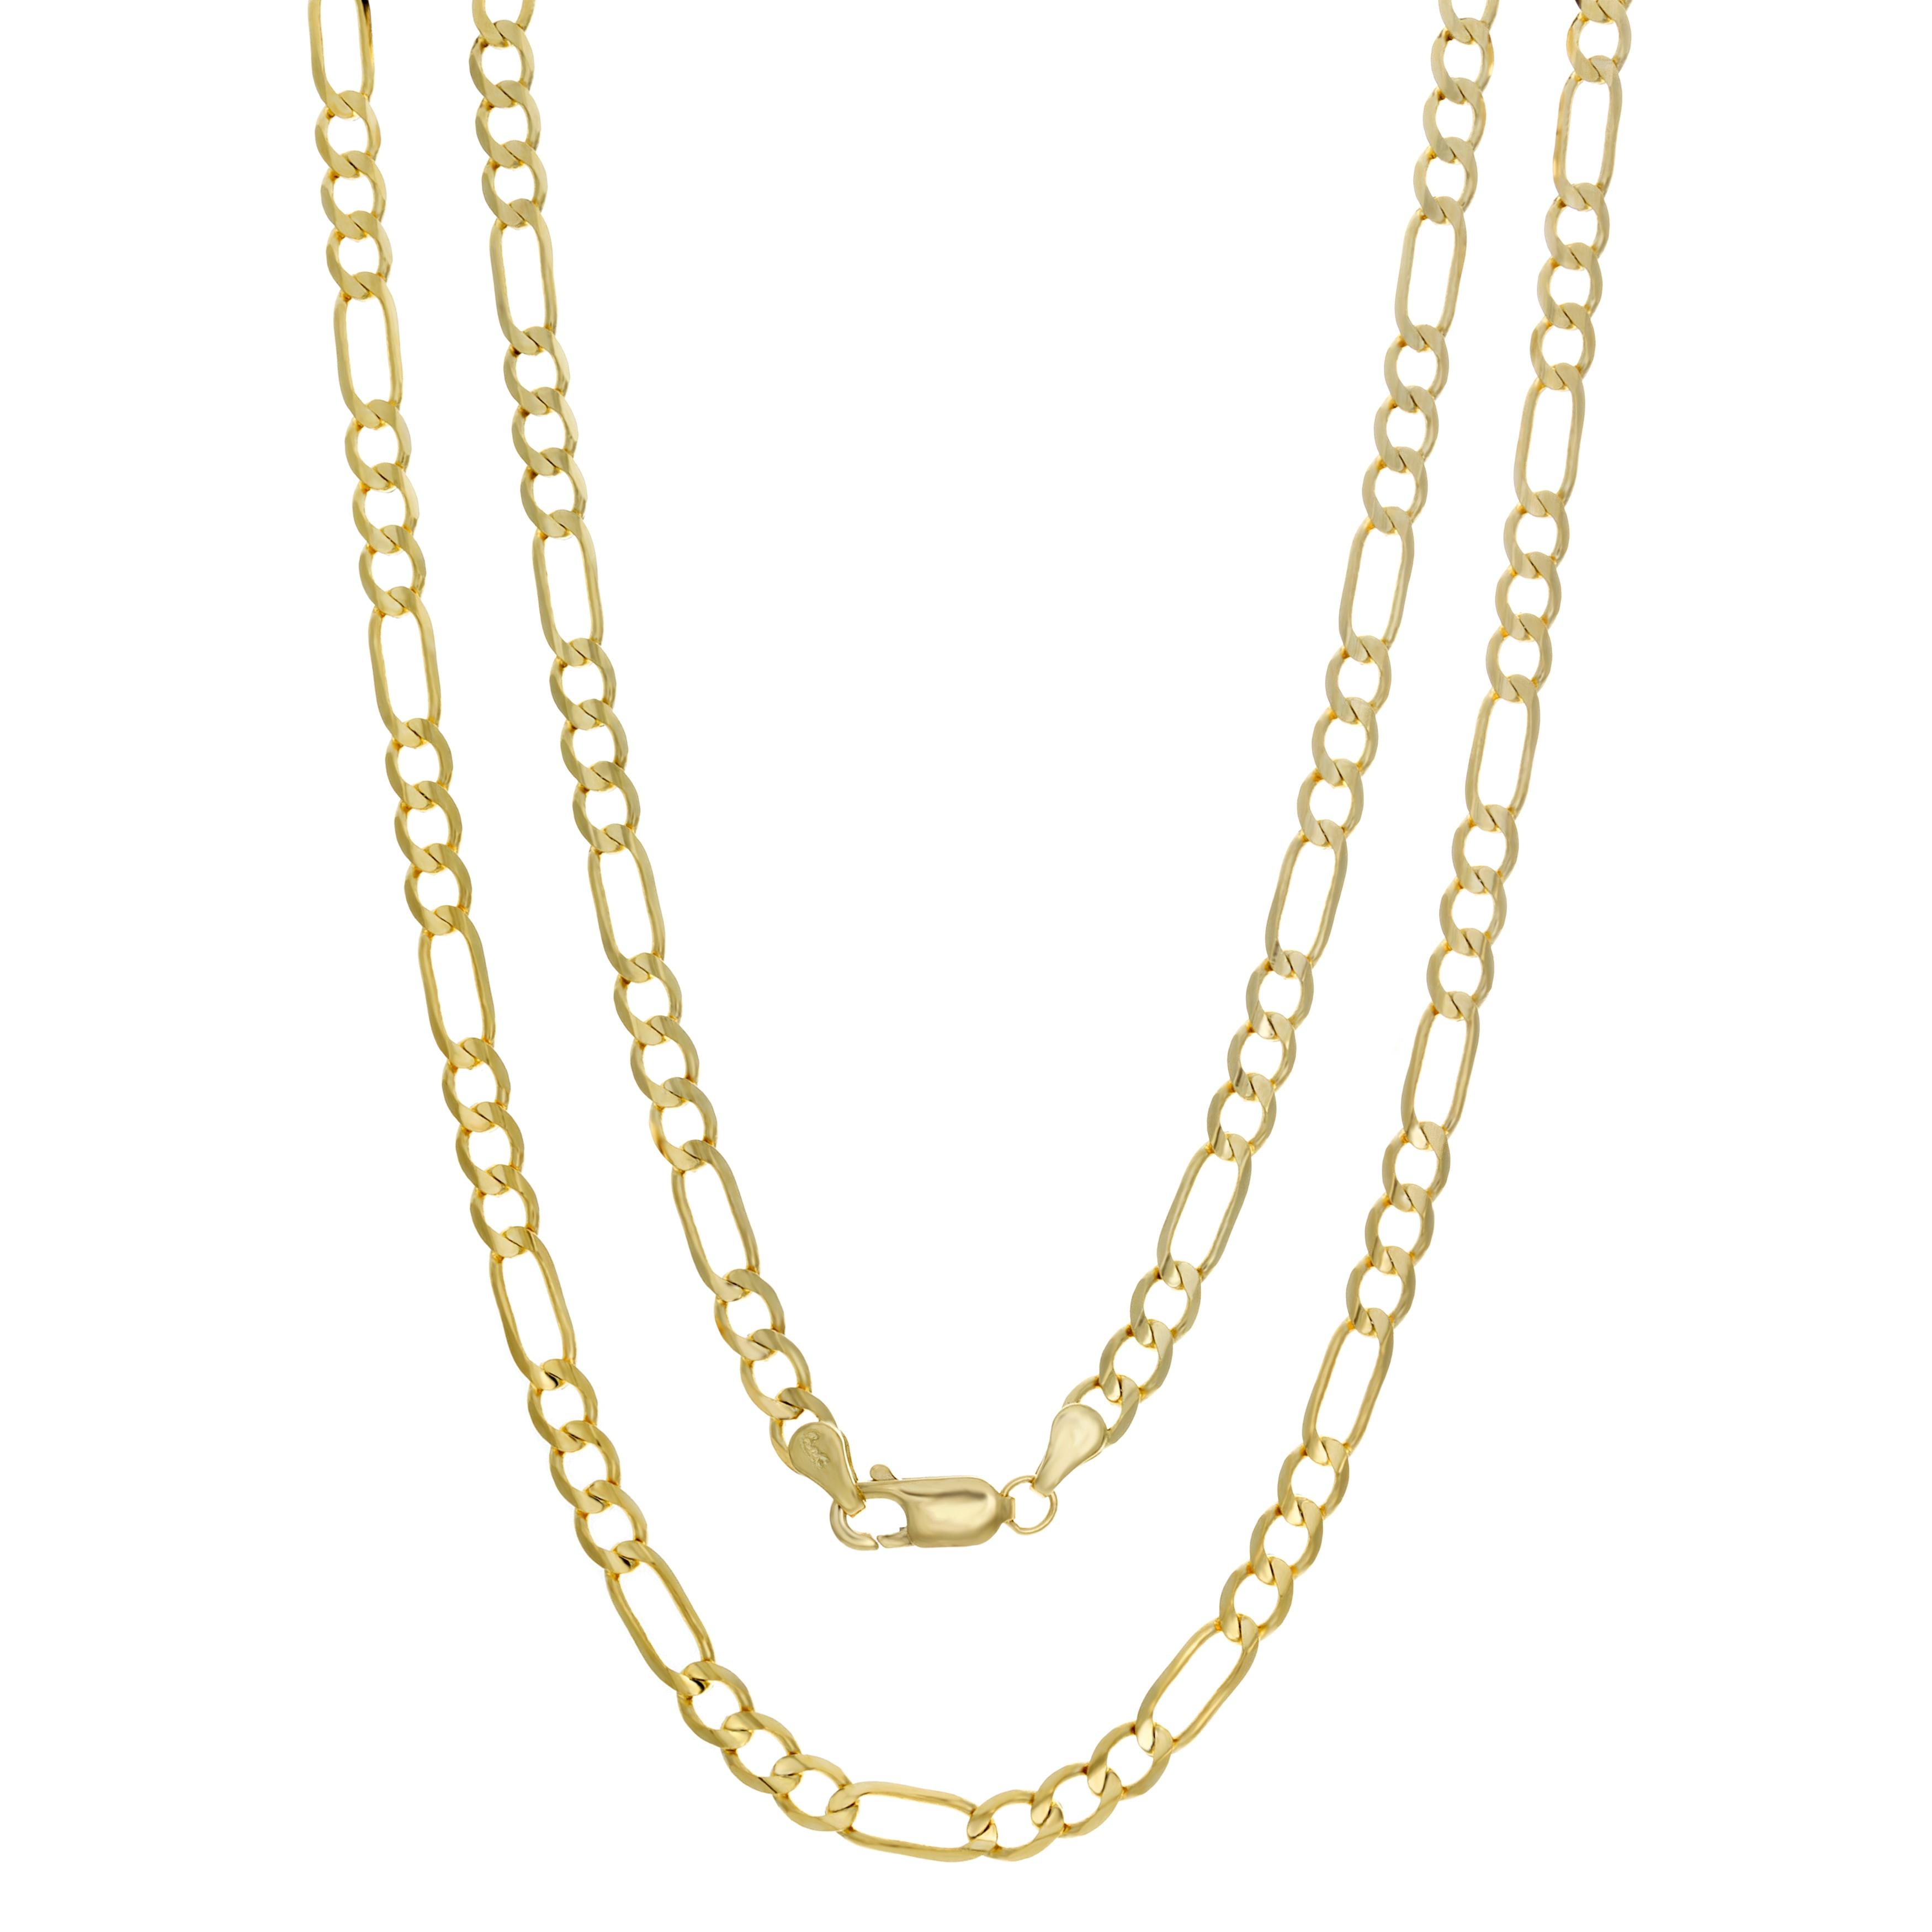 Italian Gold Chain >> Shop Roberto Martinez 14k Italian Gold 4 Mm Figaro Chain 16 30